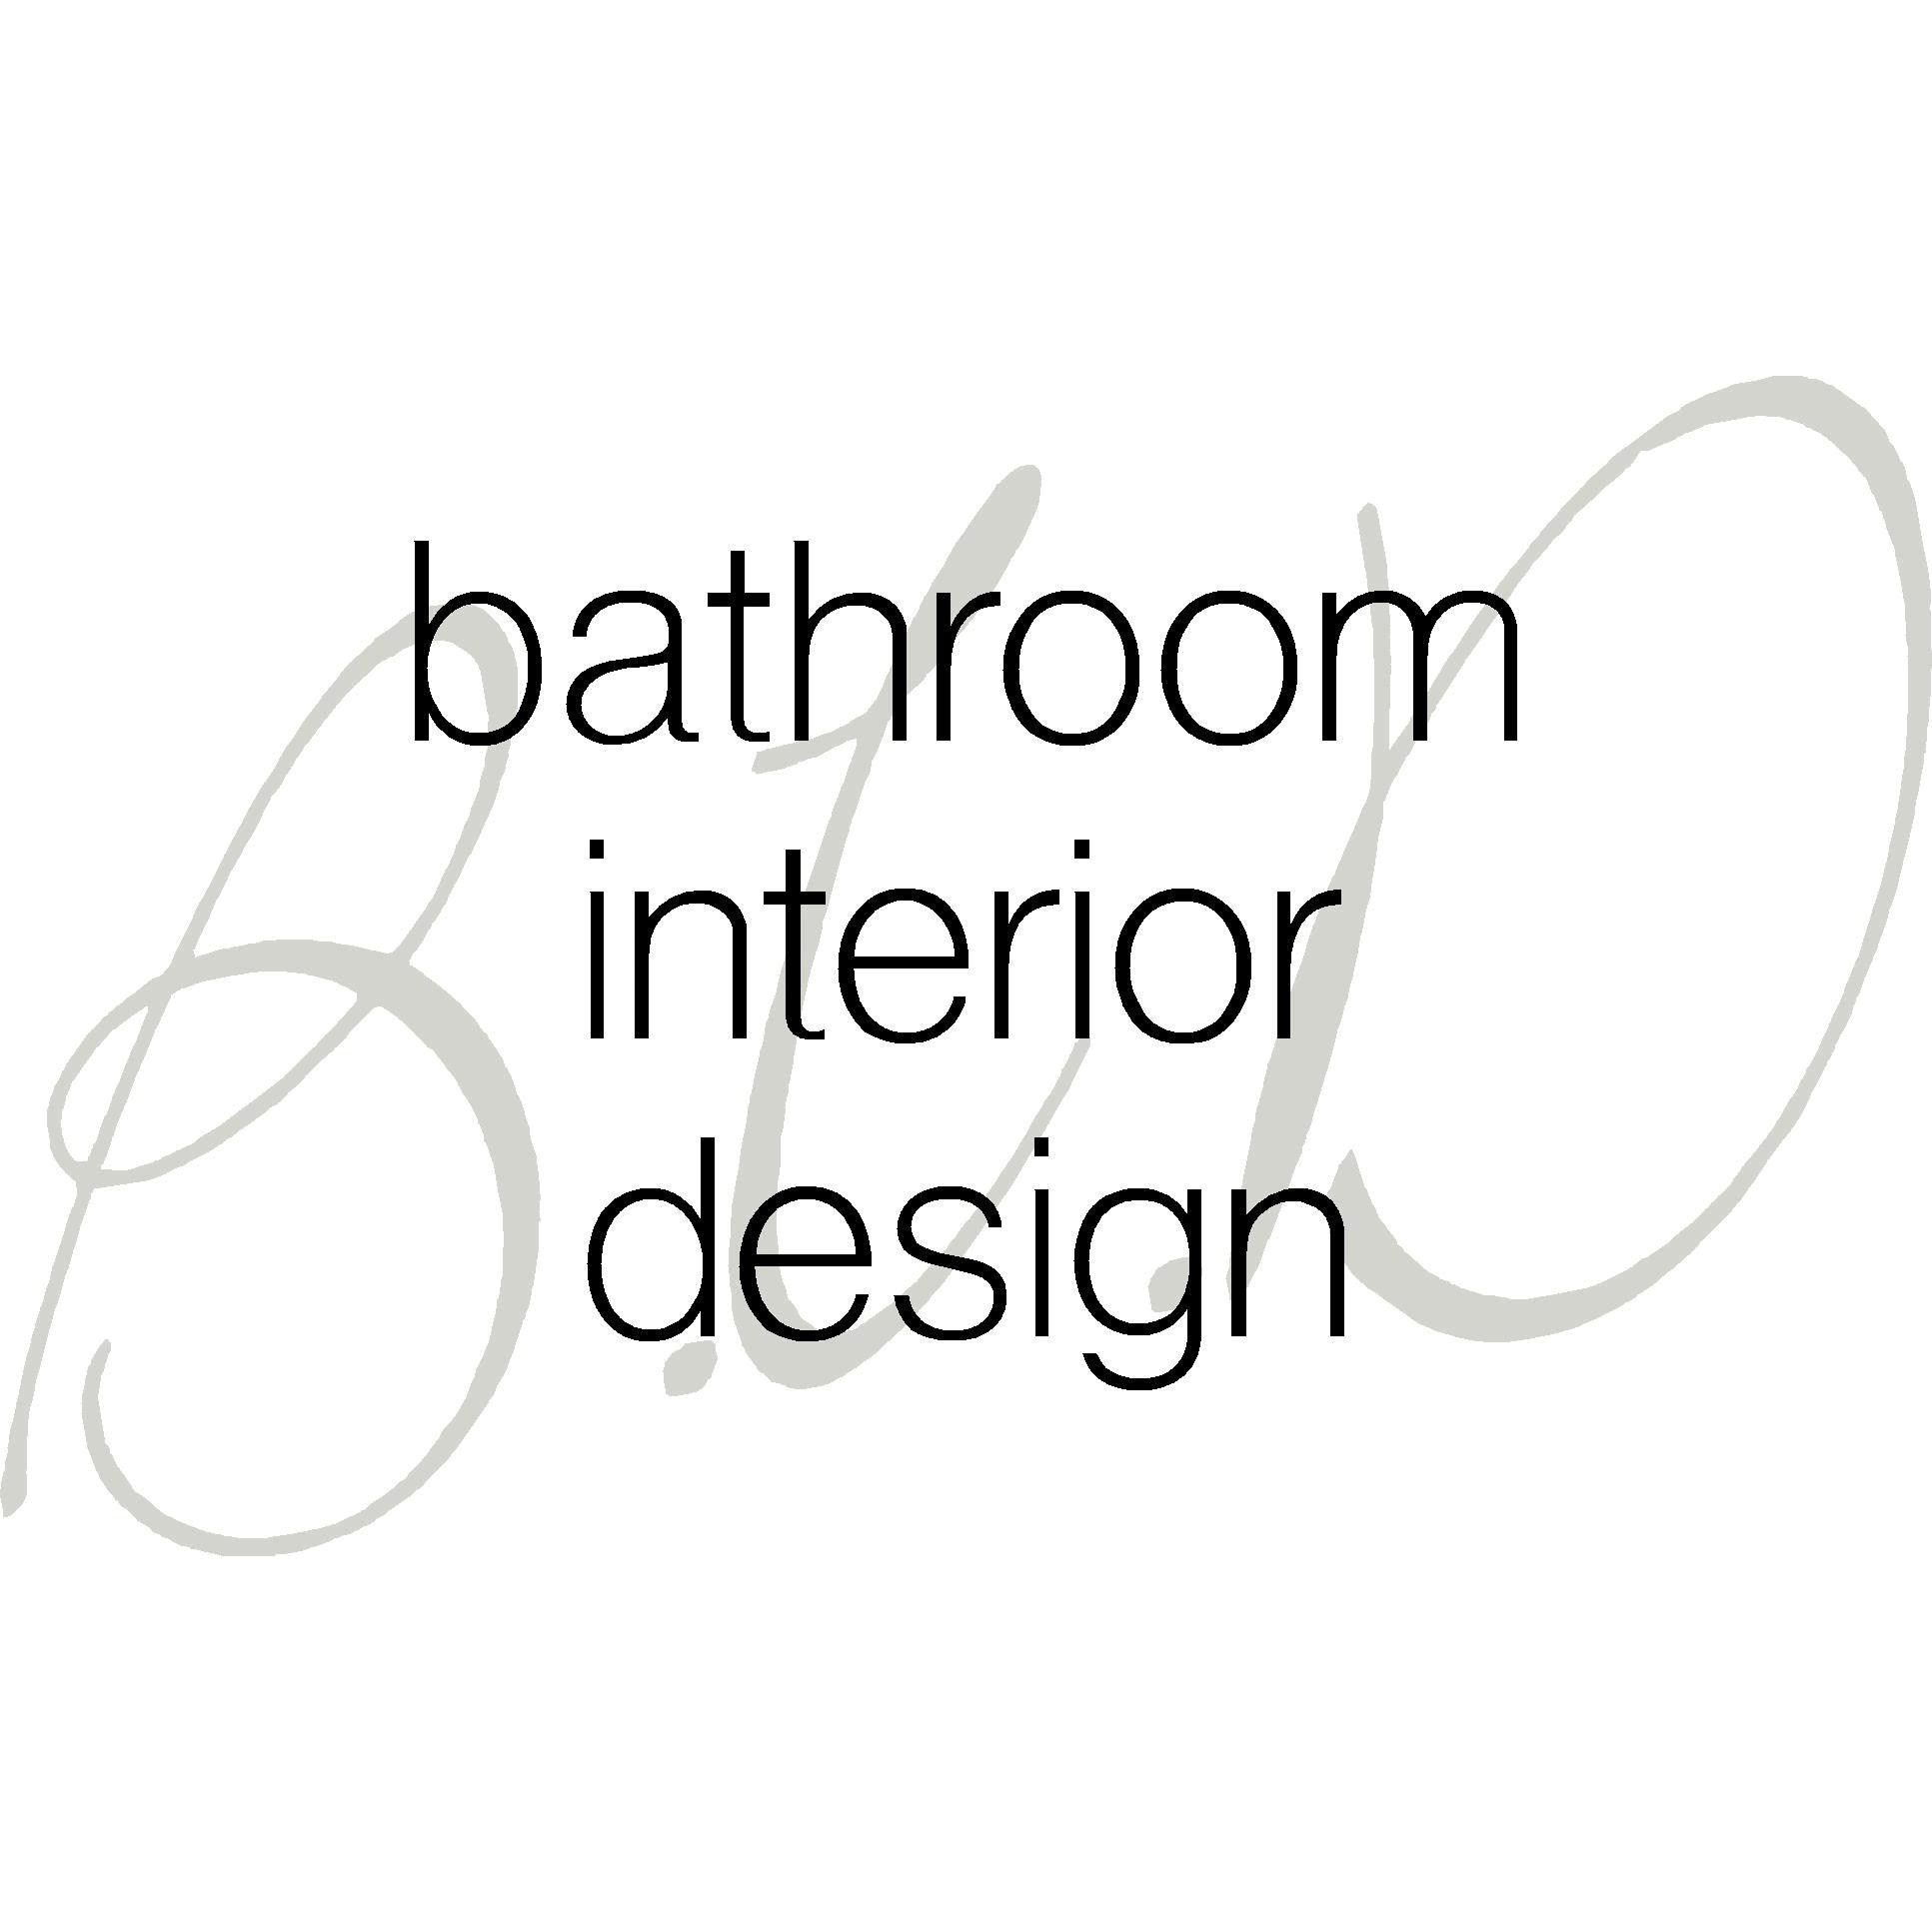 Bathroom Interior Design Ltd - Sawbridgeworth, Essex CM21 9JX - 01279 722279 | ShowMeLocal.com